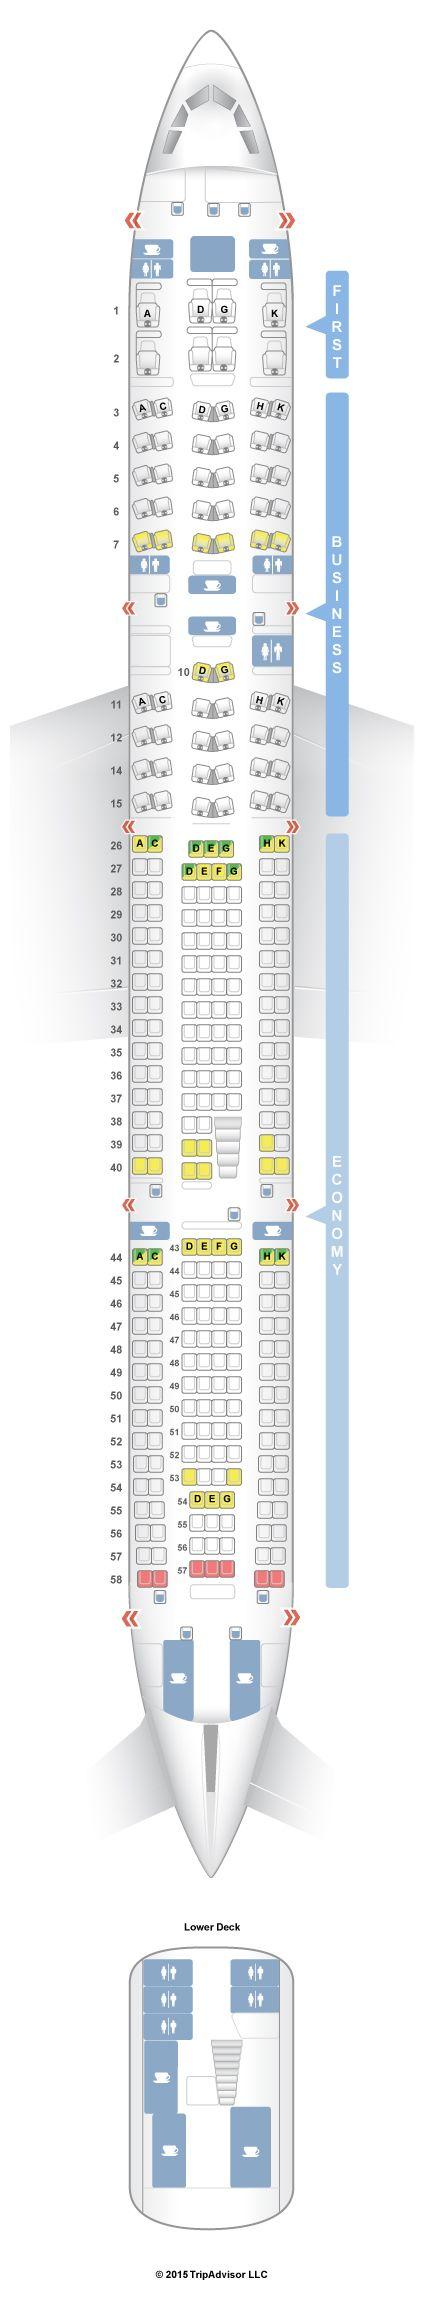 SeatGuru Seat Map Lufthansa Airbus A340-600 (346) V2